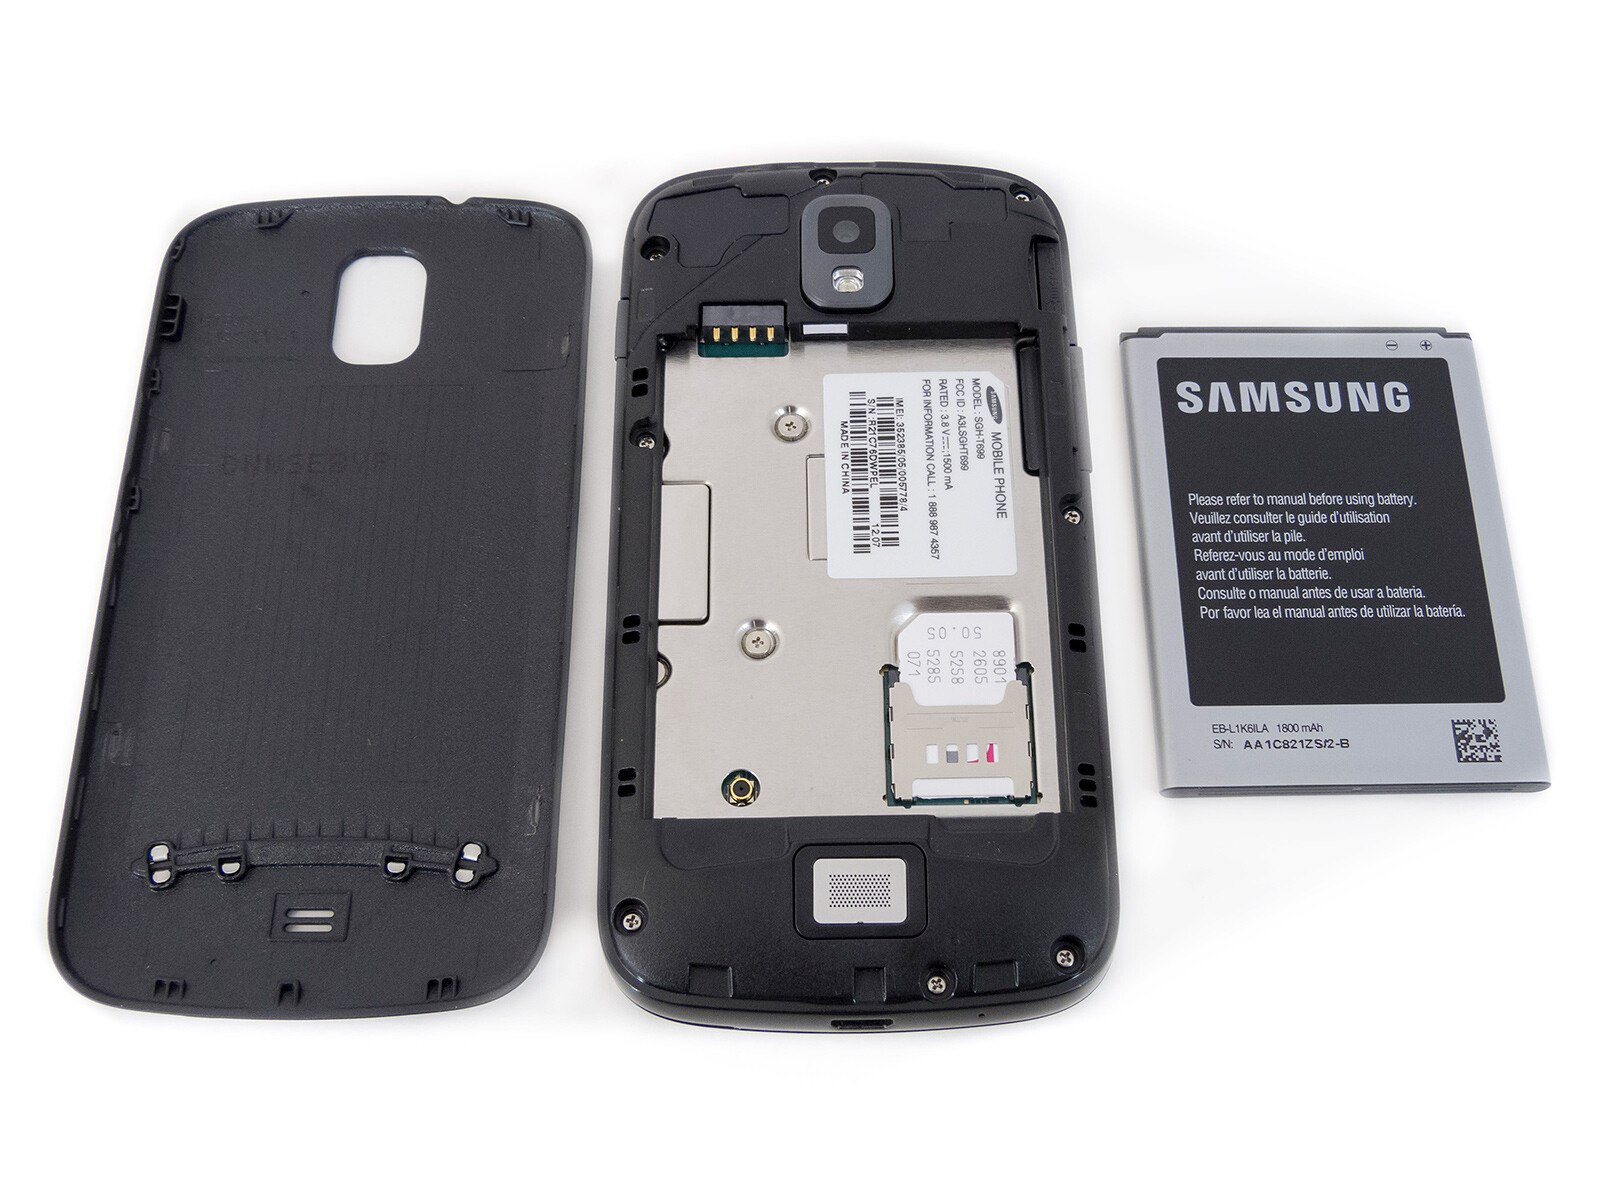 samsung galaxy s relay 4g photos rh phonearena com Compare Samsung Galaxy S Samsung Galaxy S Relay And Compare Samsung Galaxy S Samsung Galaxy S Relay And